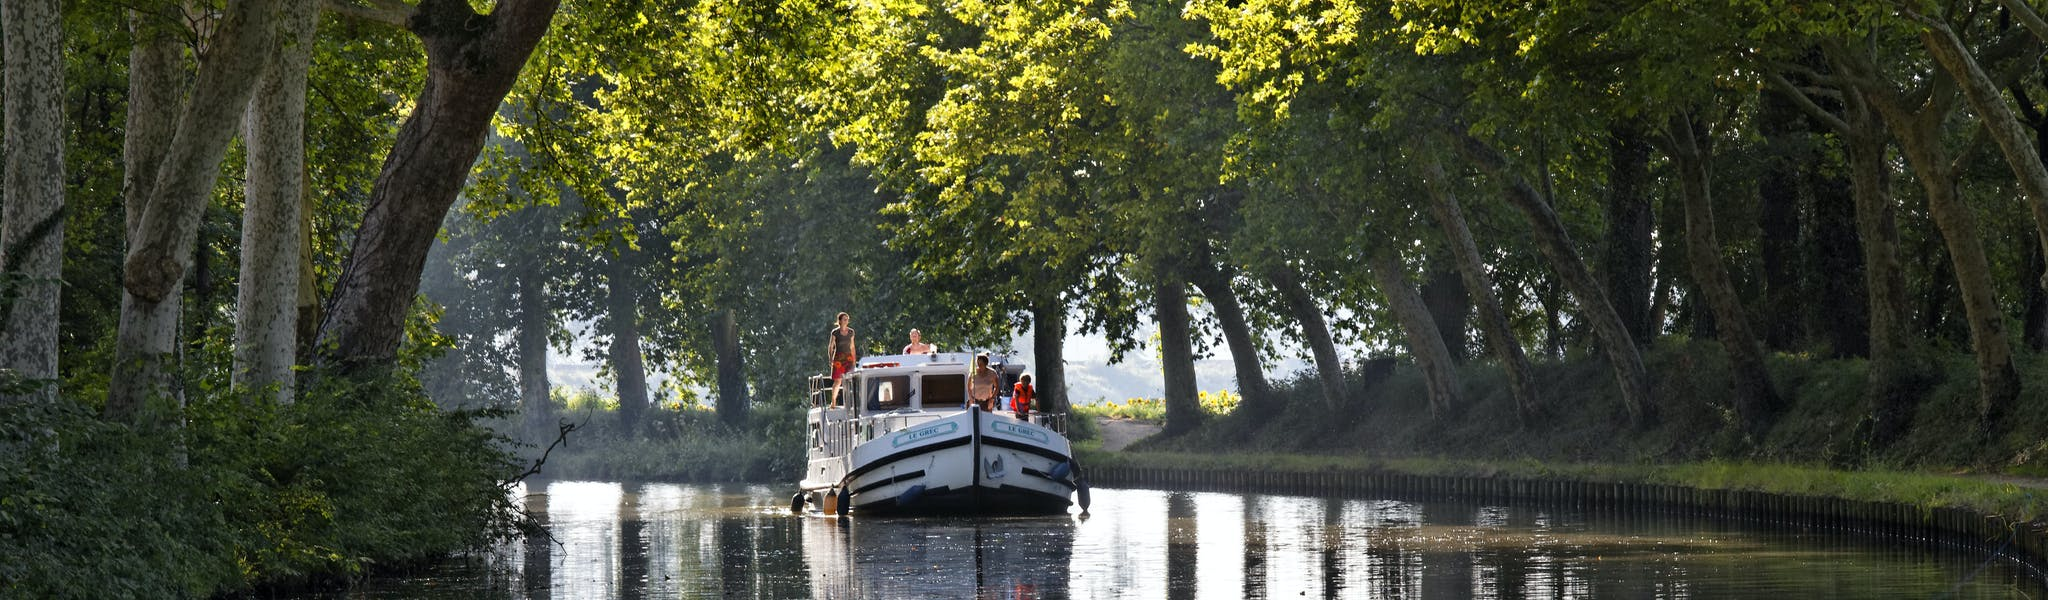 Locaboat vaargebied Canal di Midi